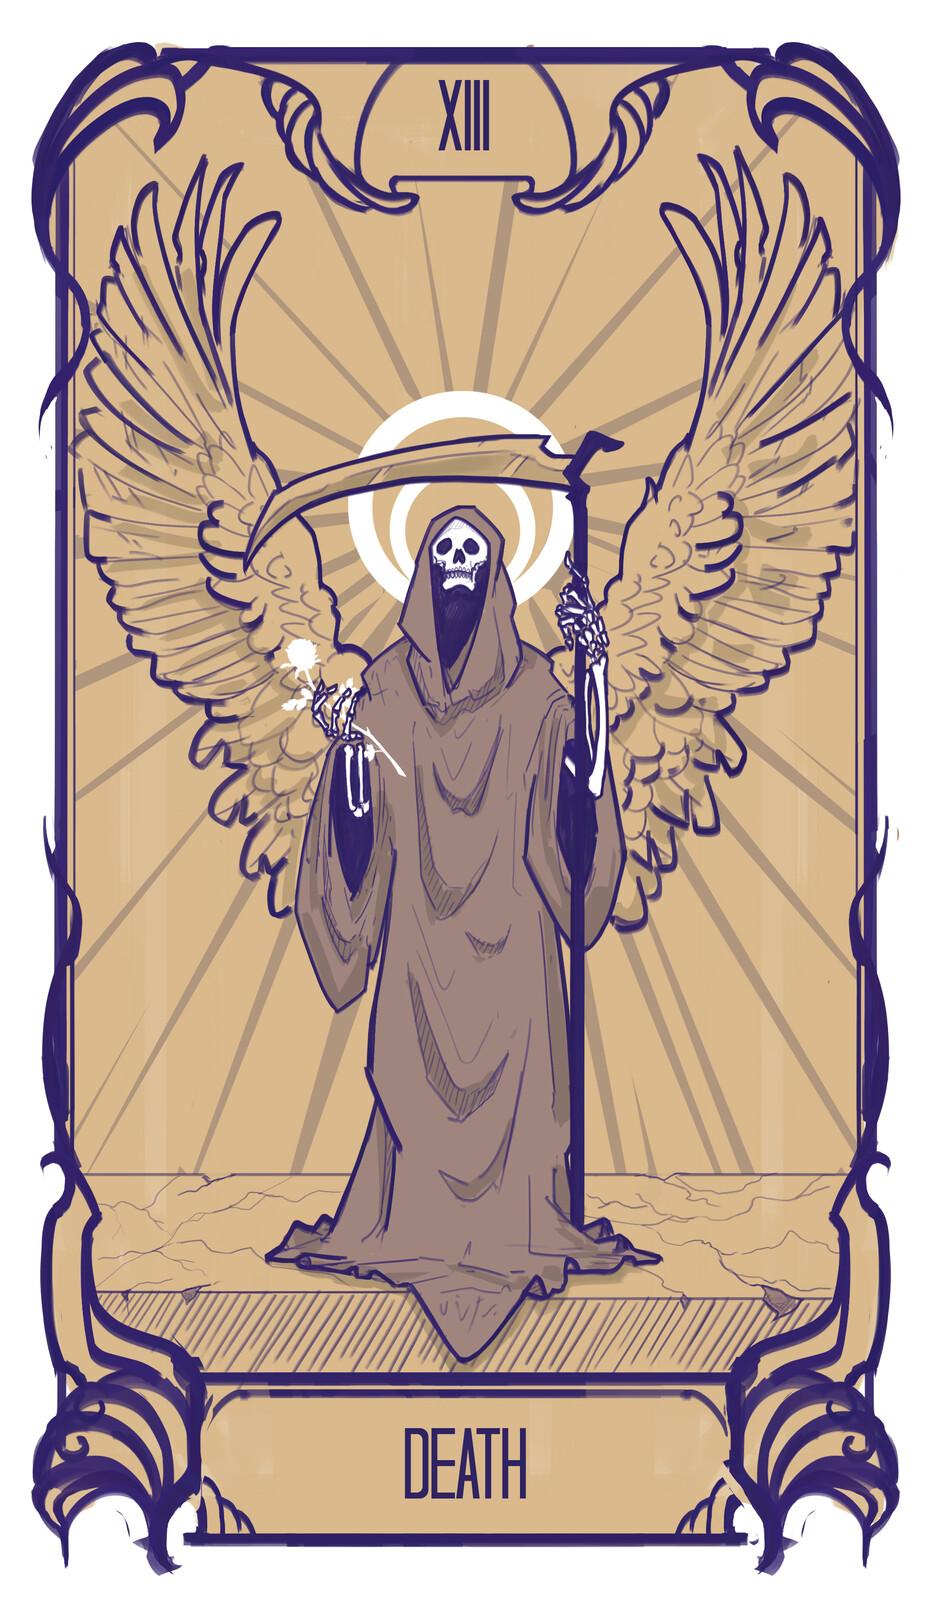 13. Death